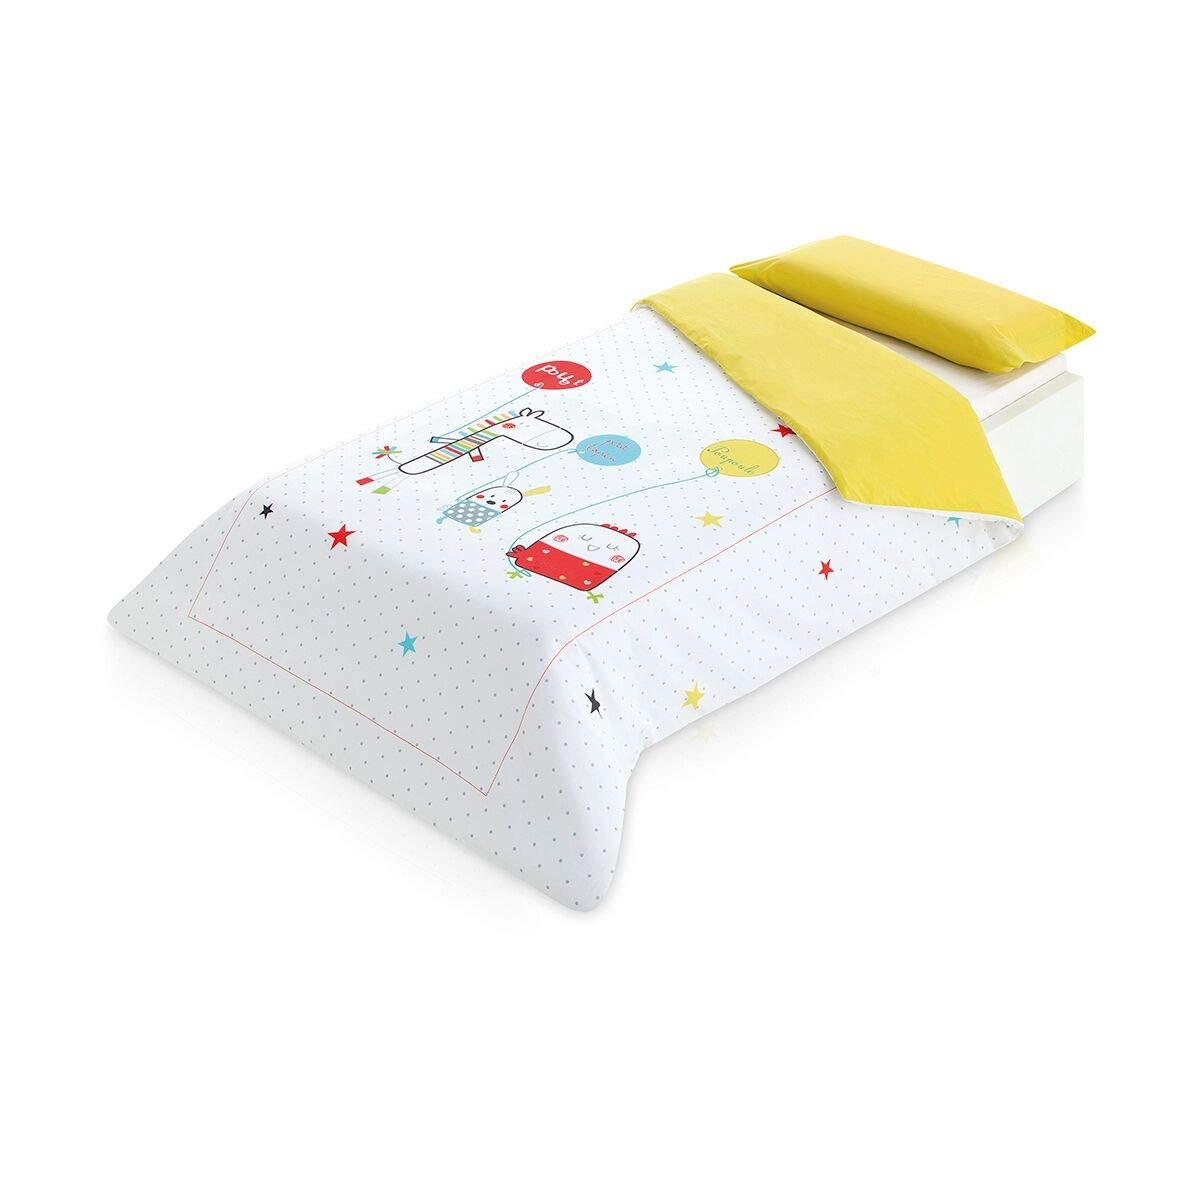 Pirulos Lapin Bettbezug und Kissenbezug